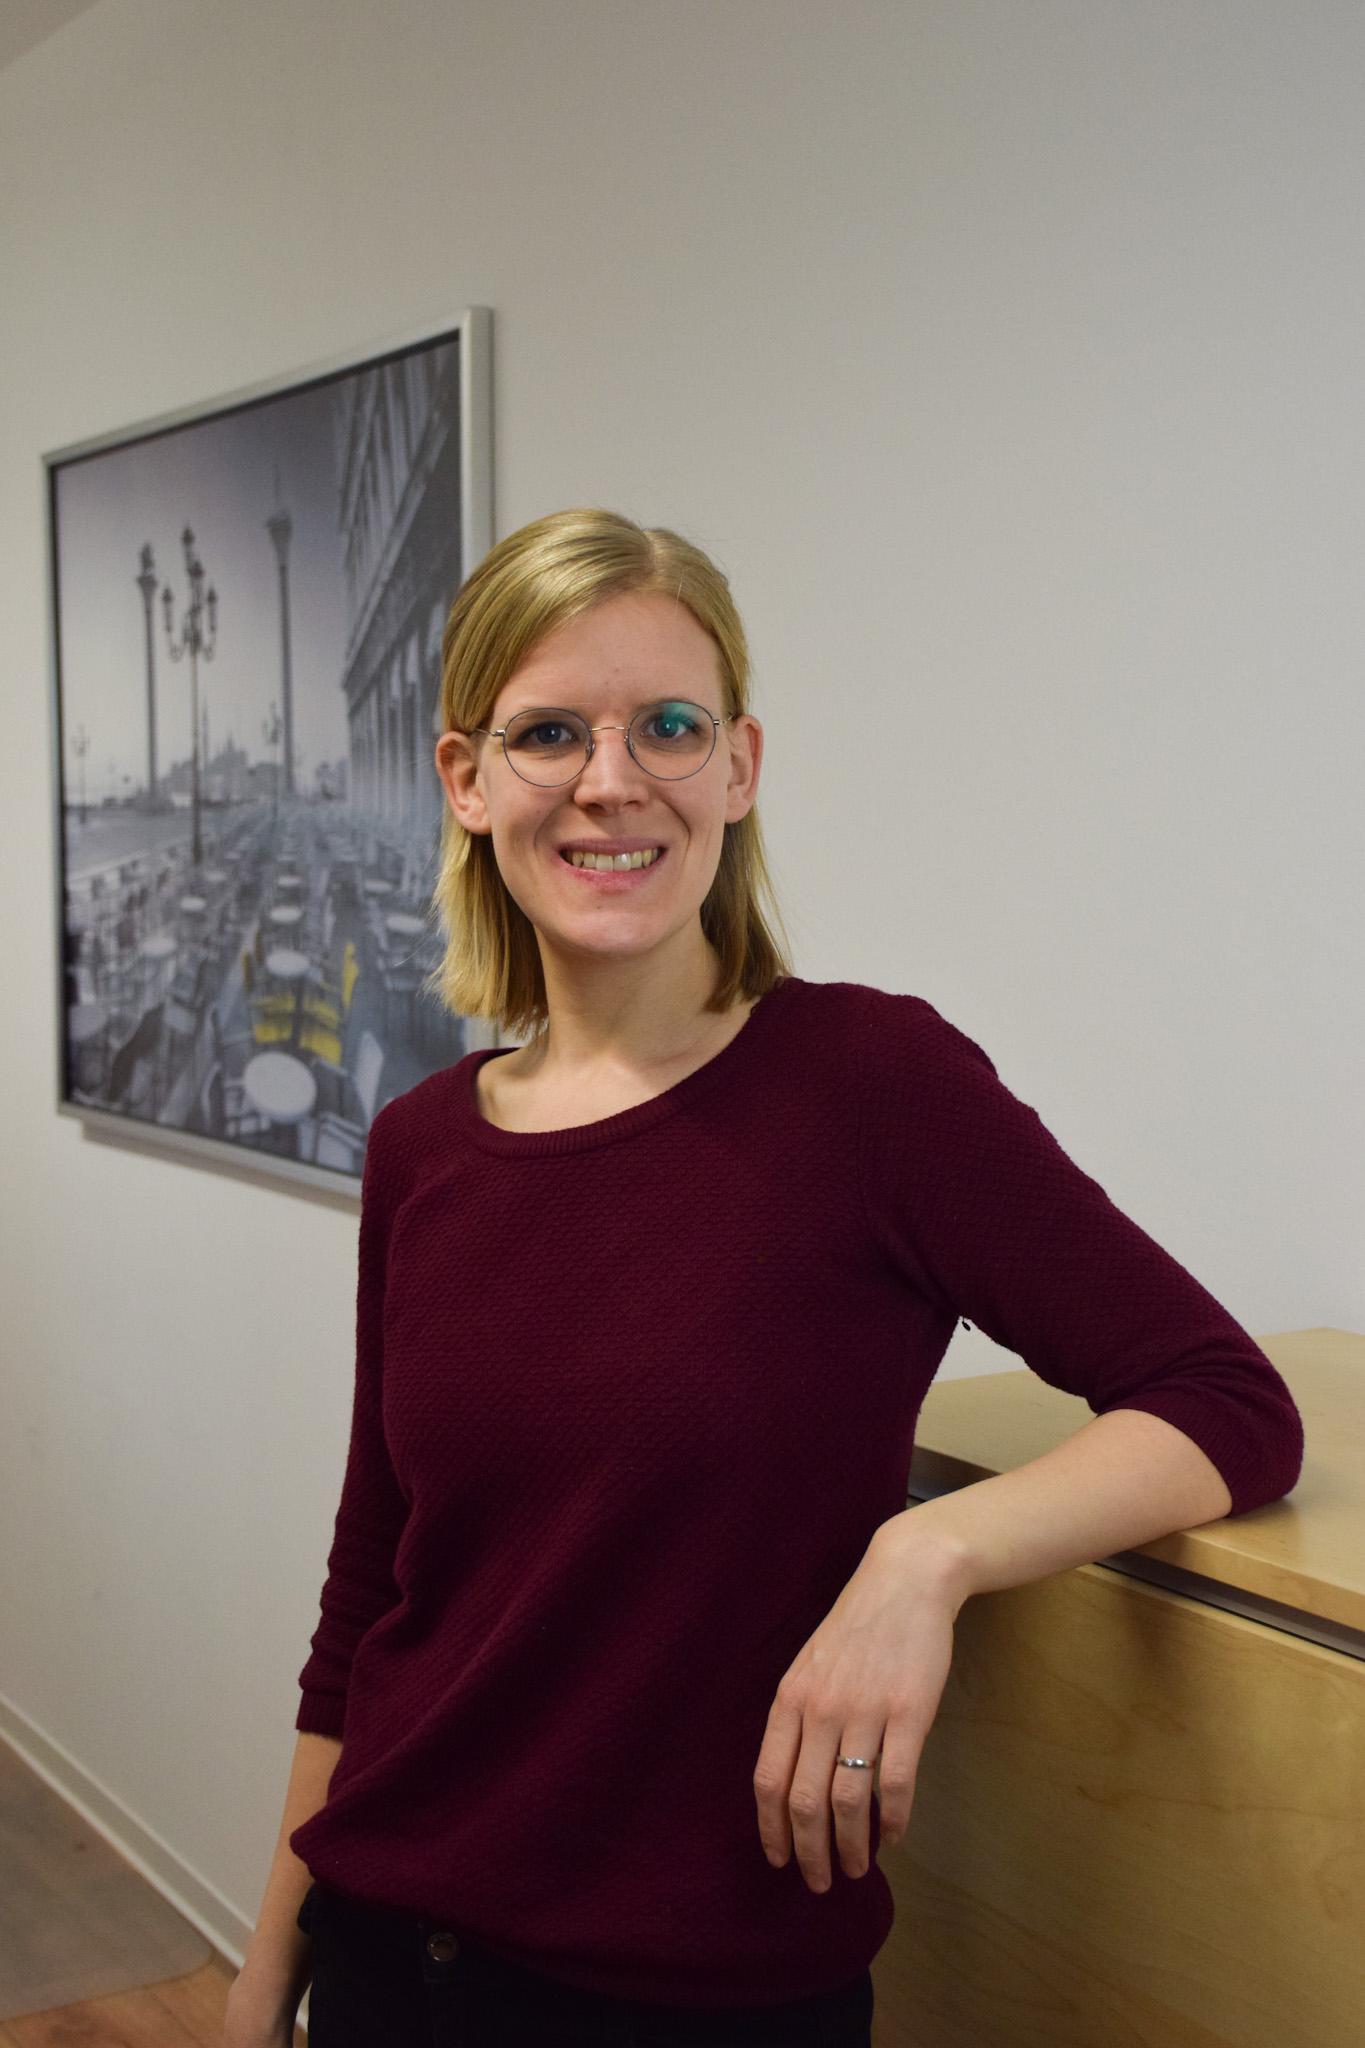 Sabine Krix